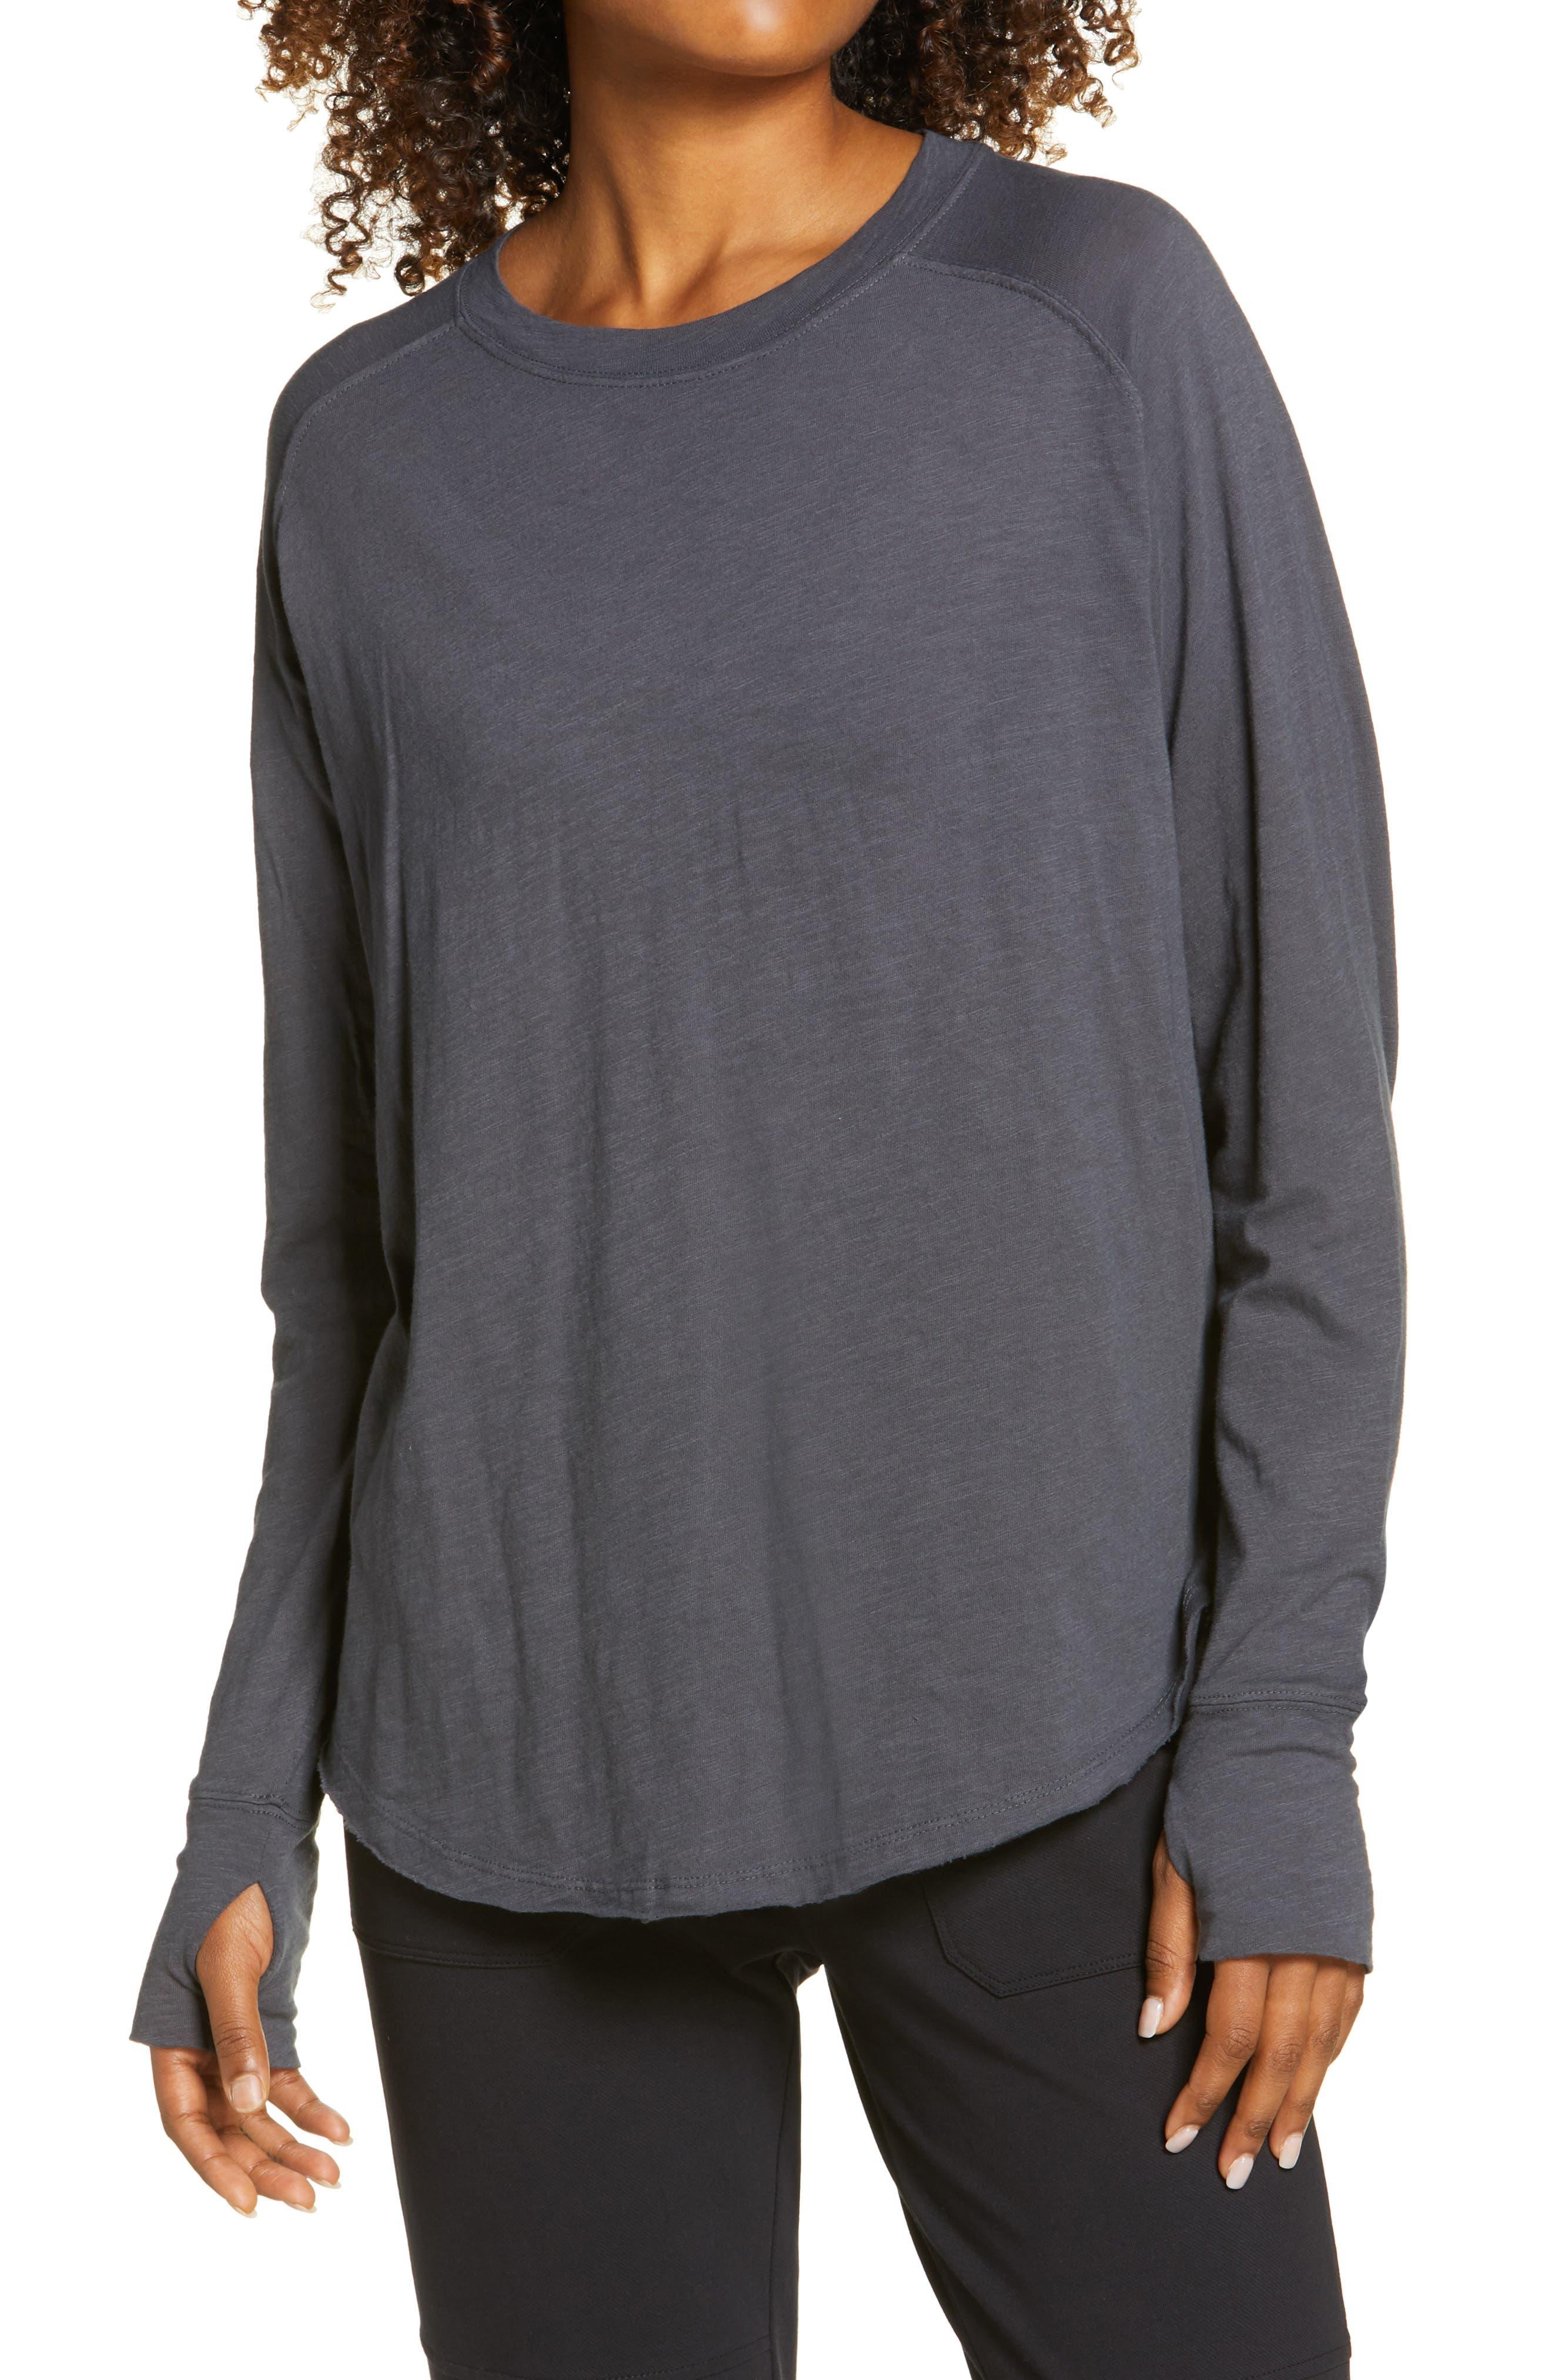 Women T-Shirt Short Sleeve Deep V-Neck Shirt Beautiful Eyes Graphic Tee Shirt Casual Tops and Blouse